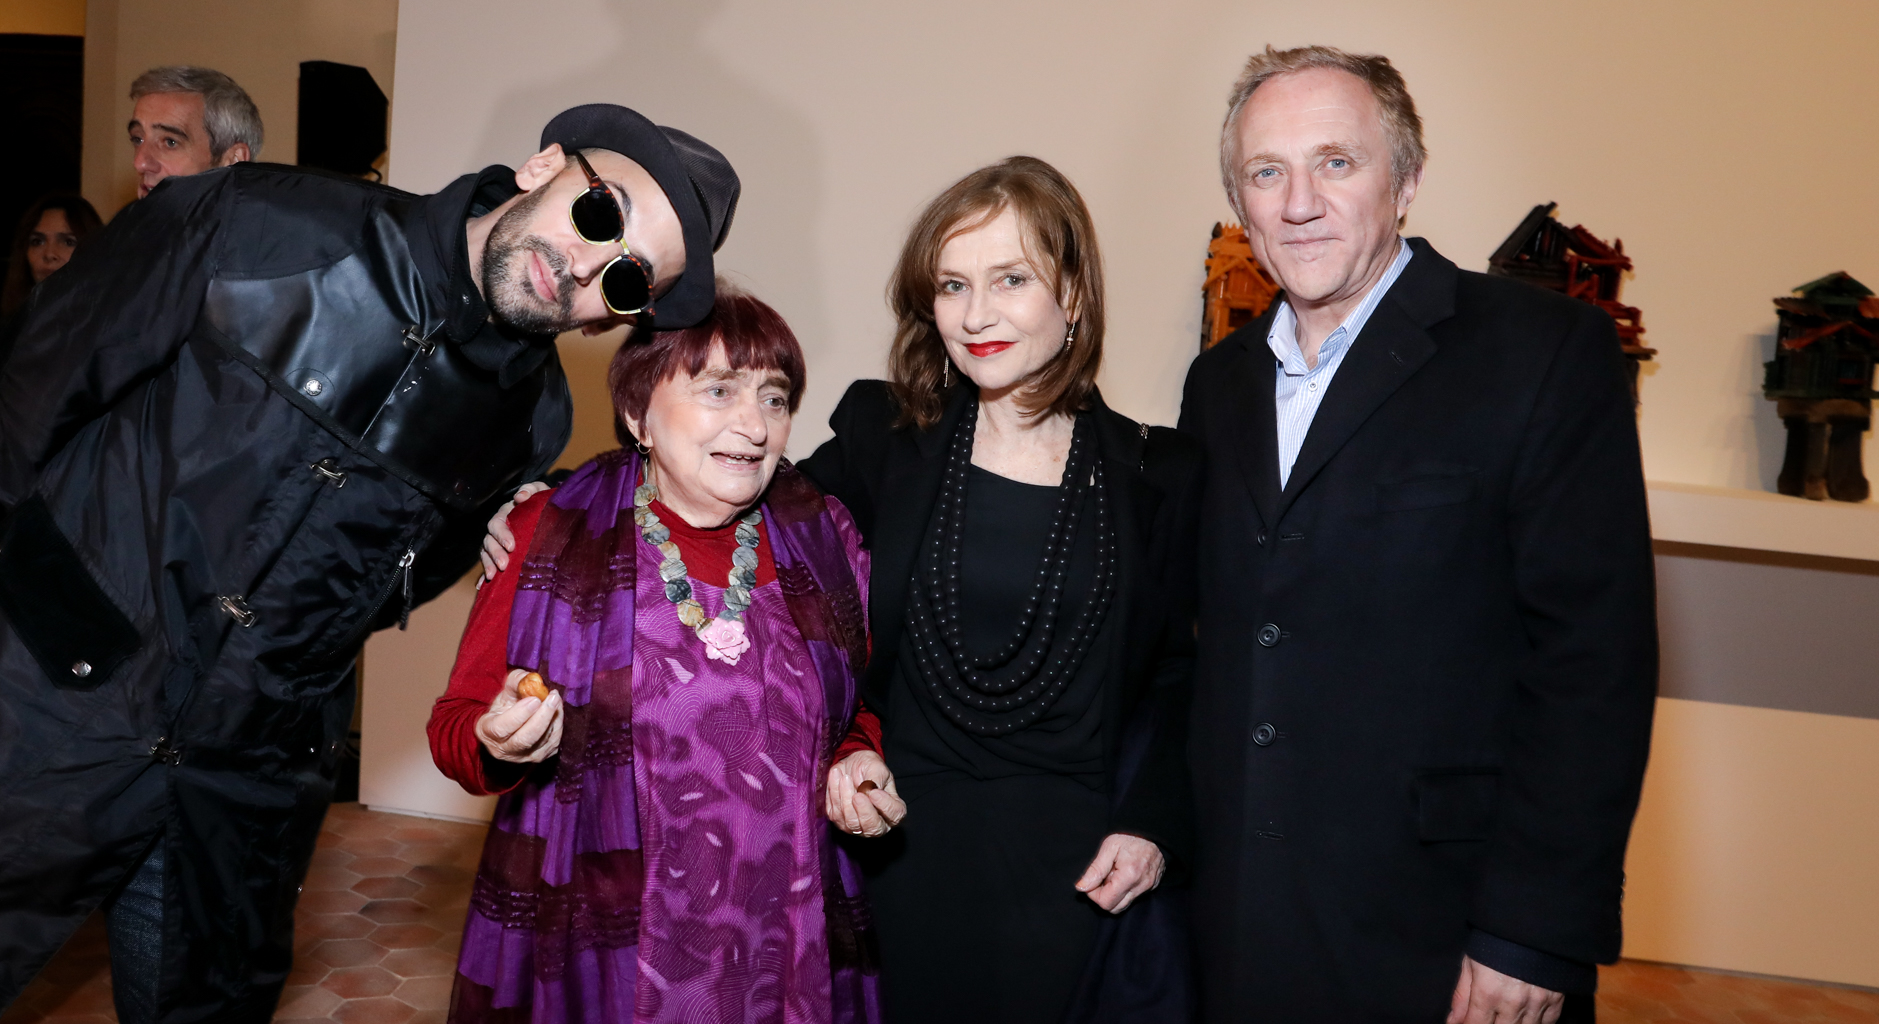 Kering Celebrates Agnès Varda's Honorary Oscar